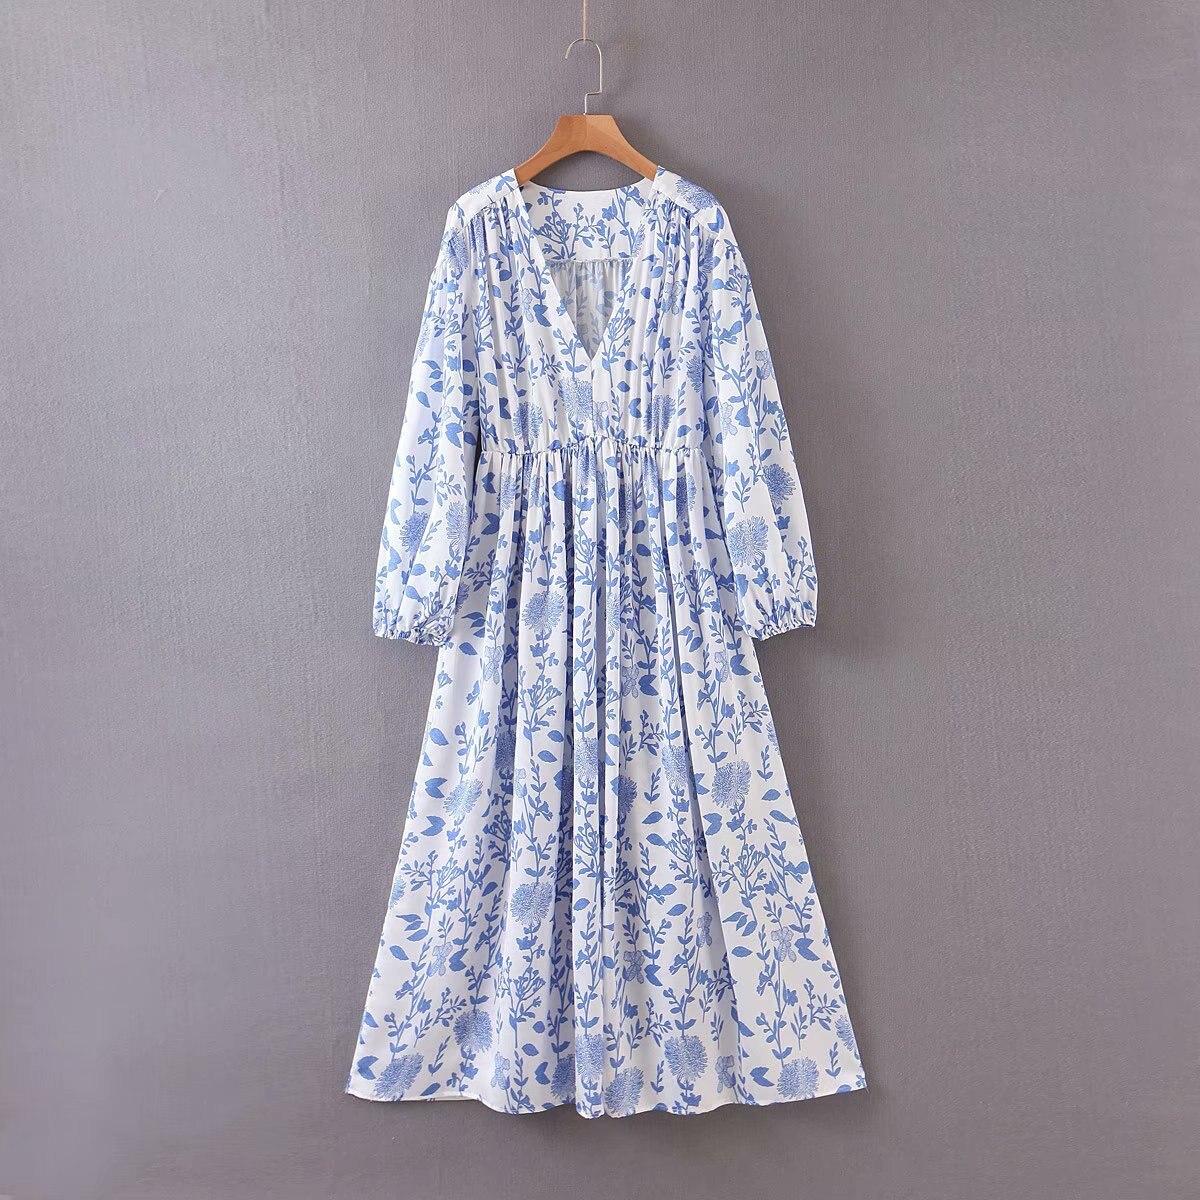 2020 New Spring Summer European Blue And White Porcelain Printed Blue Zaraing Women Dress Vadiming Sheining Female Dress XDL2605